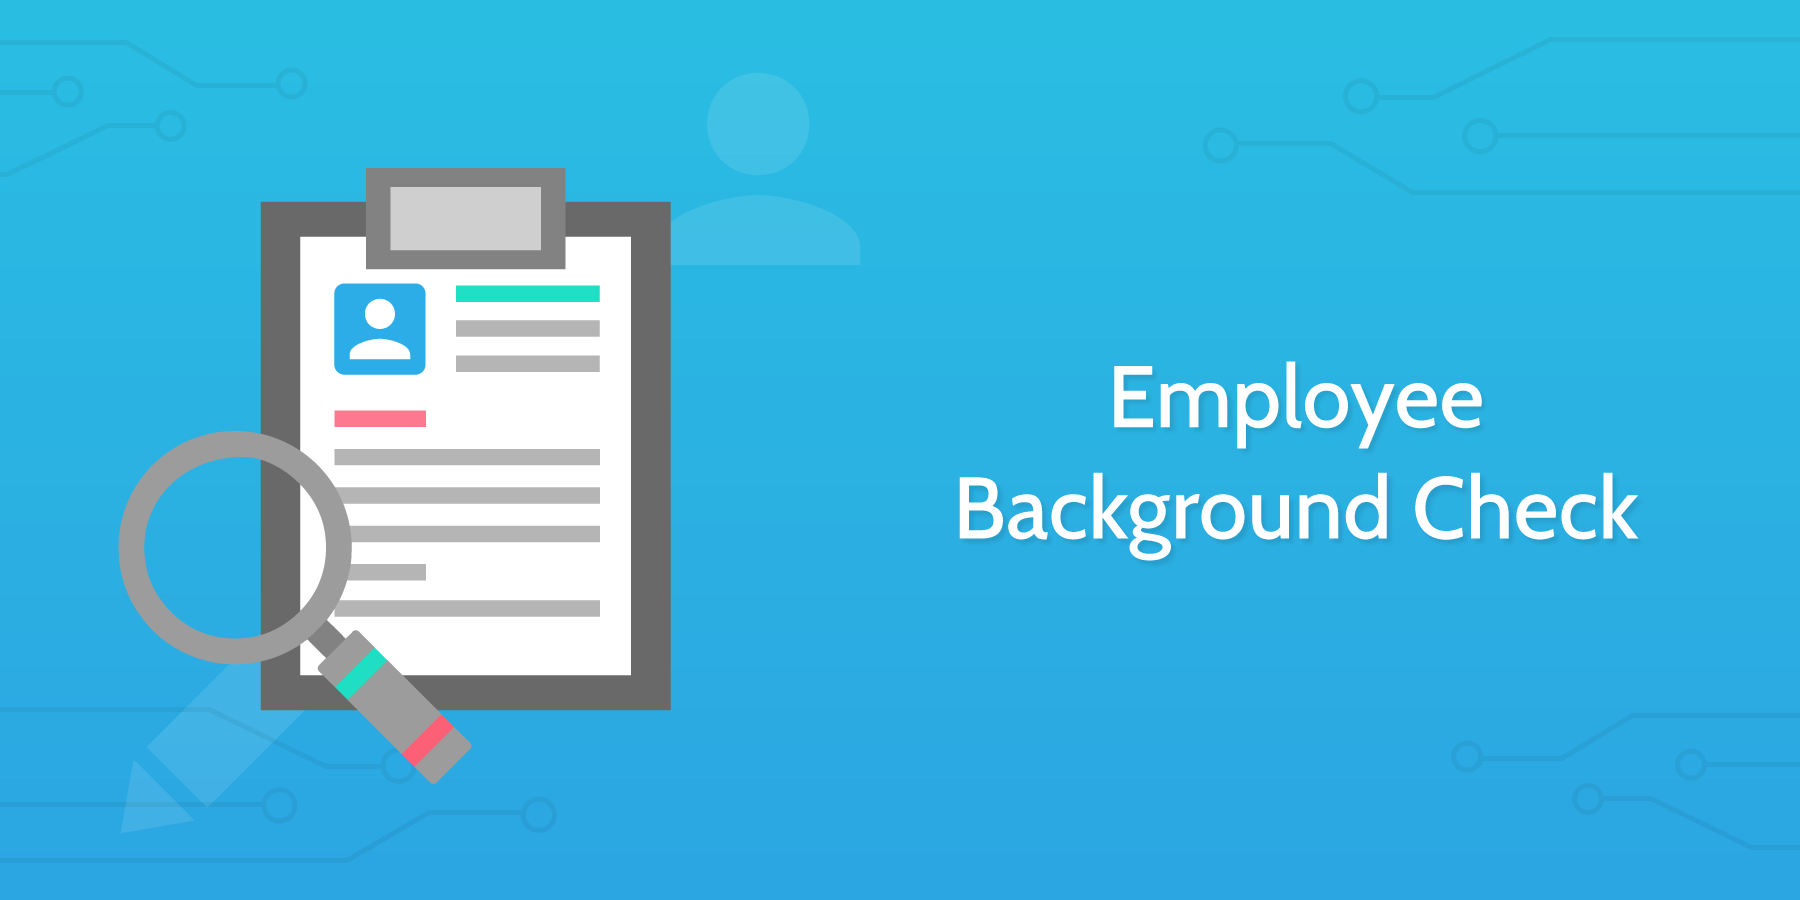 New client checklist - Employee Background Check